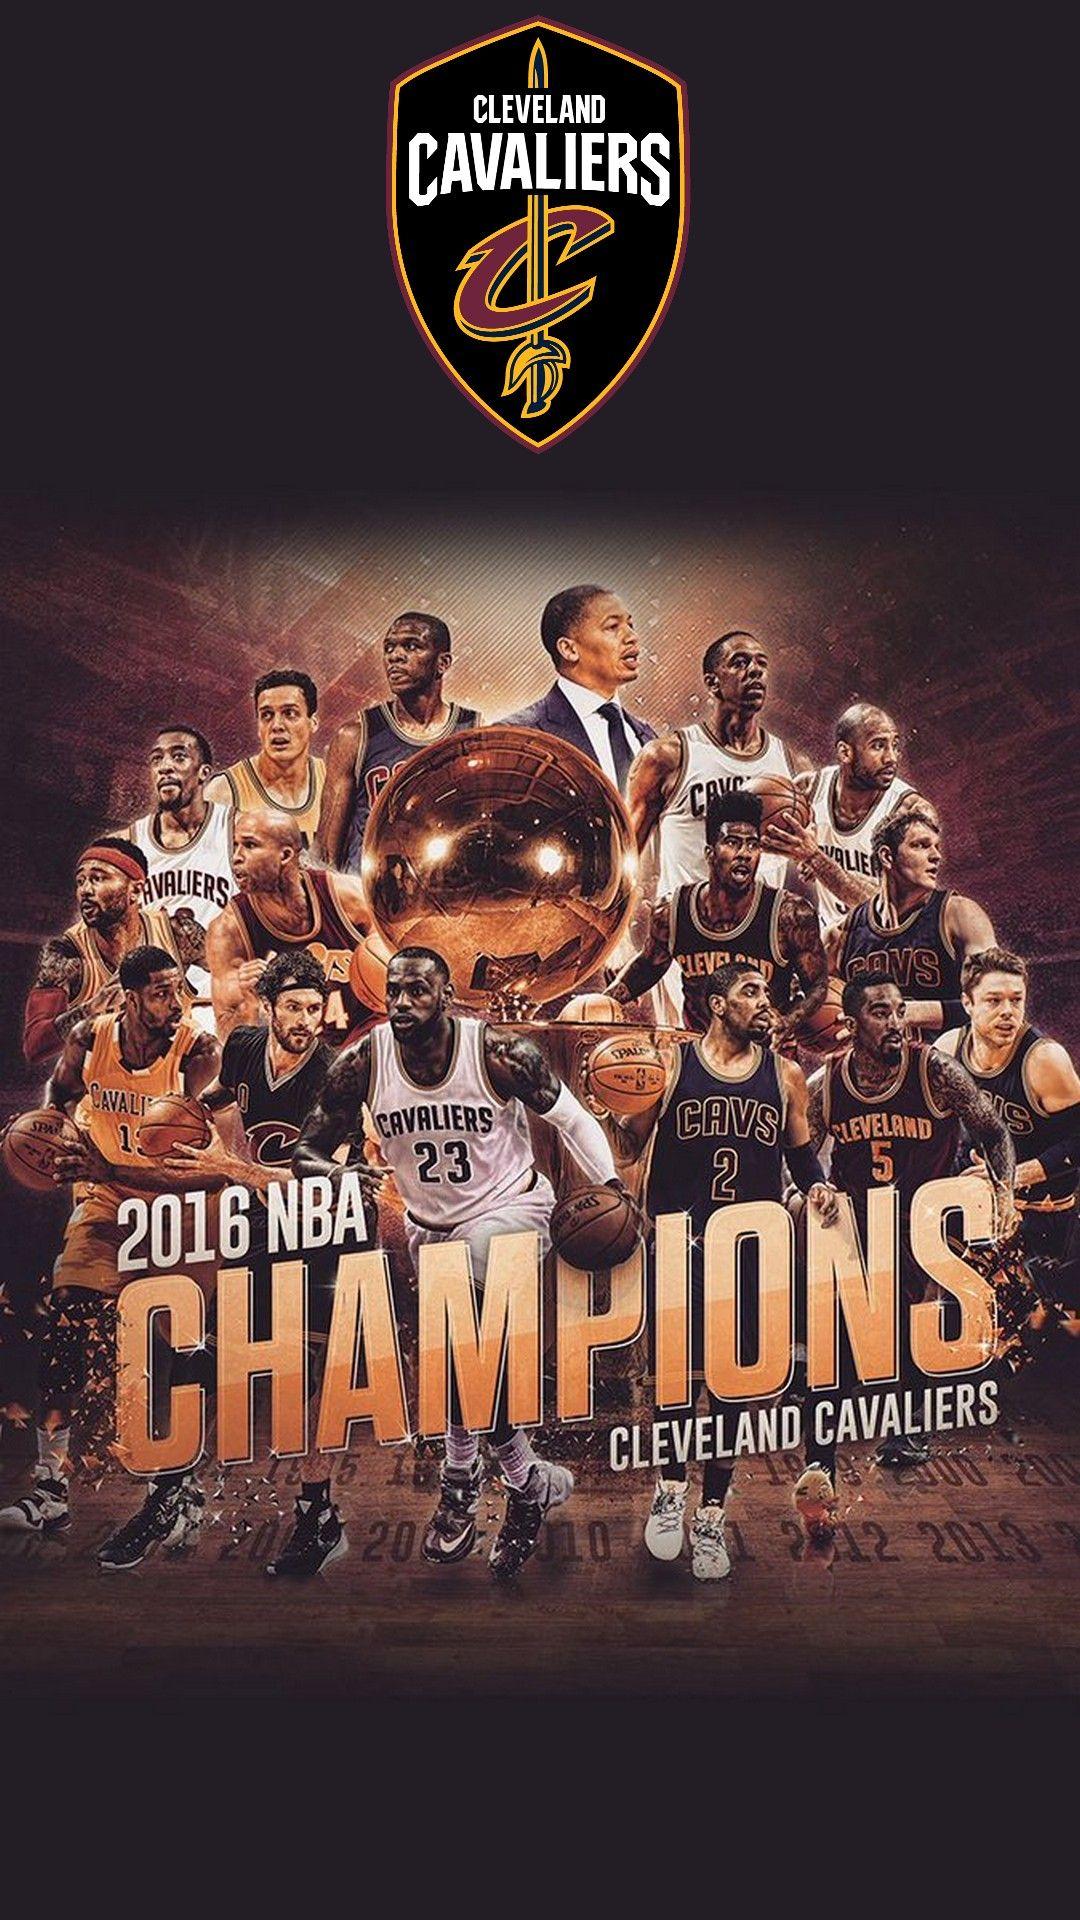 Cleveland Cavaliers Nba Wallpaper Mobile 2021 Basketball Wallpaper Cavaliers Wallpaper Cavs Wallpaper Nba Wallpapers